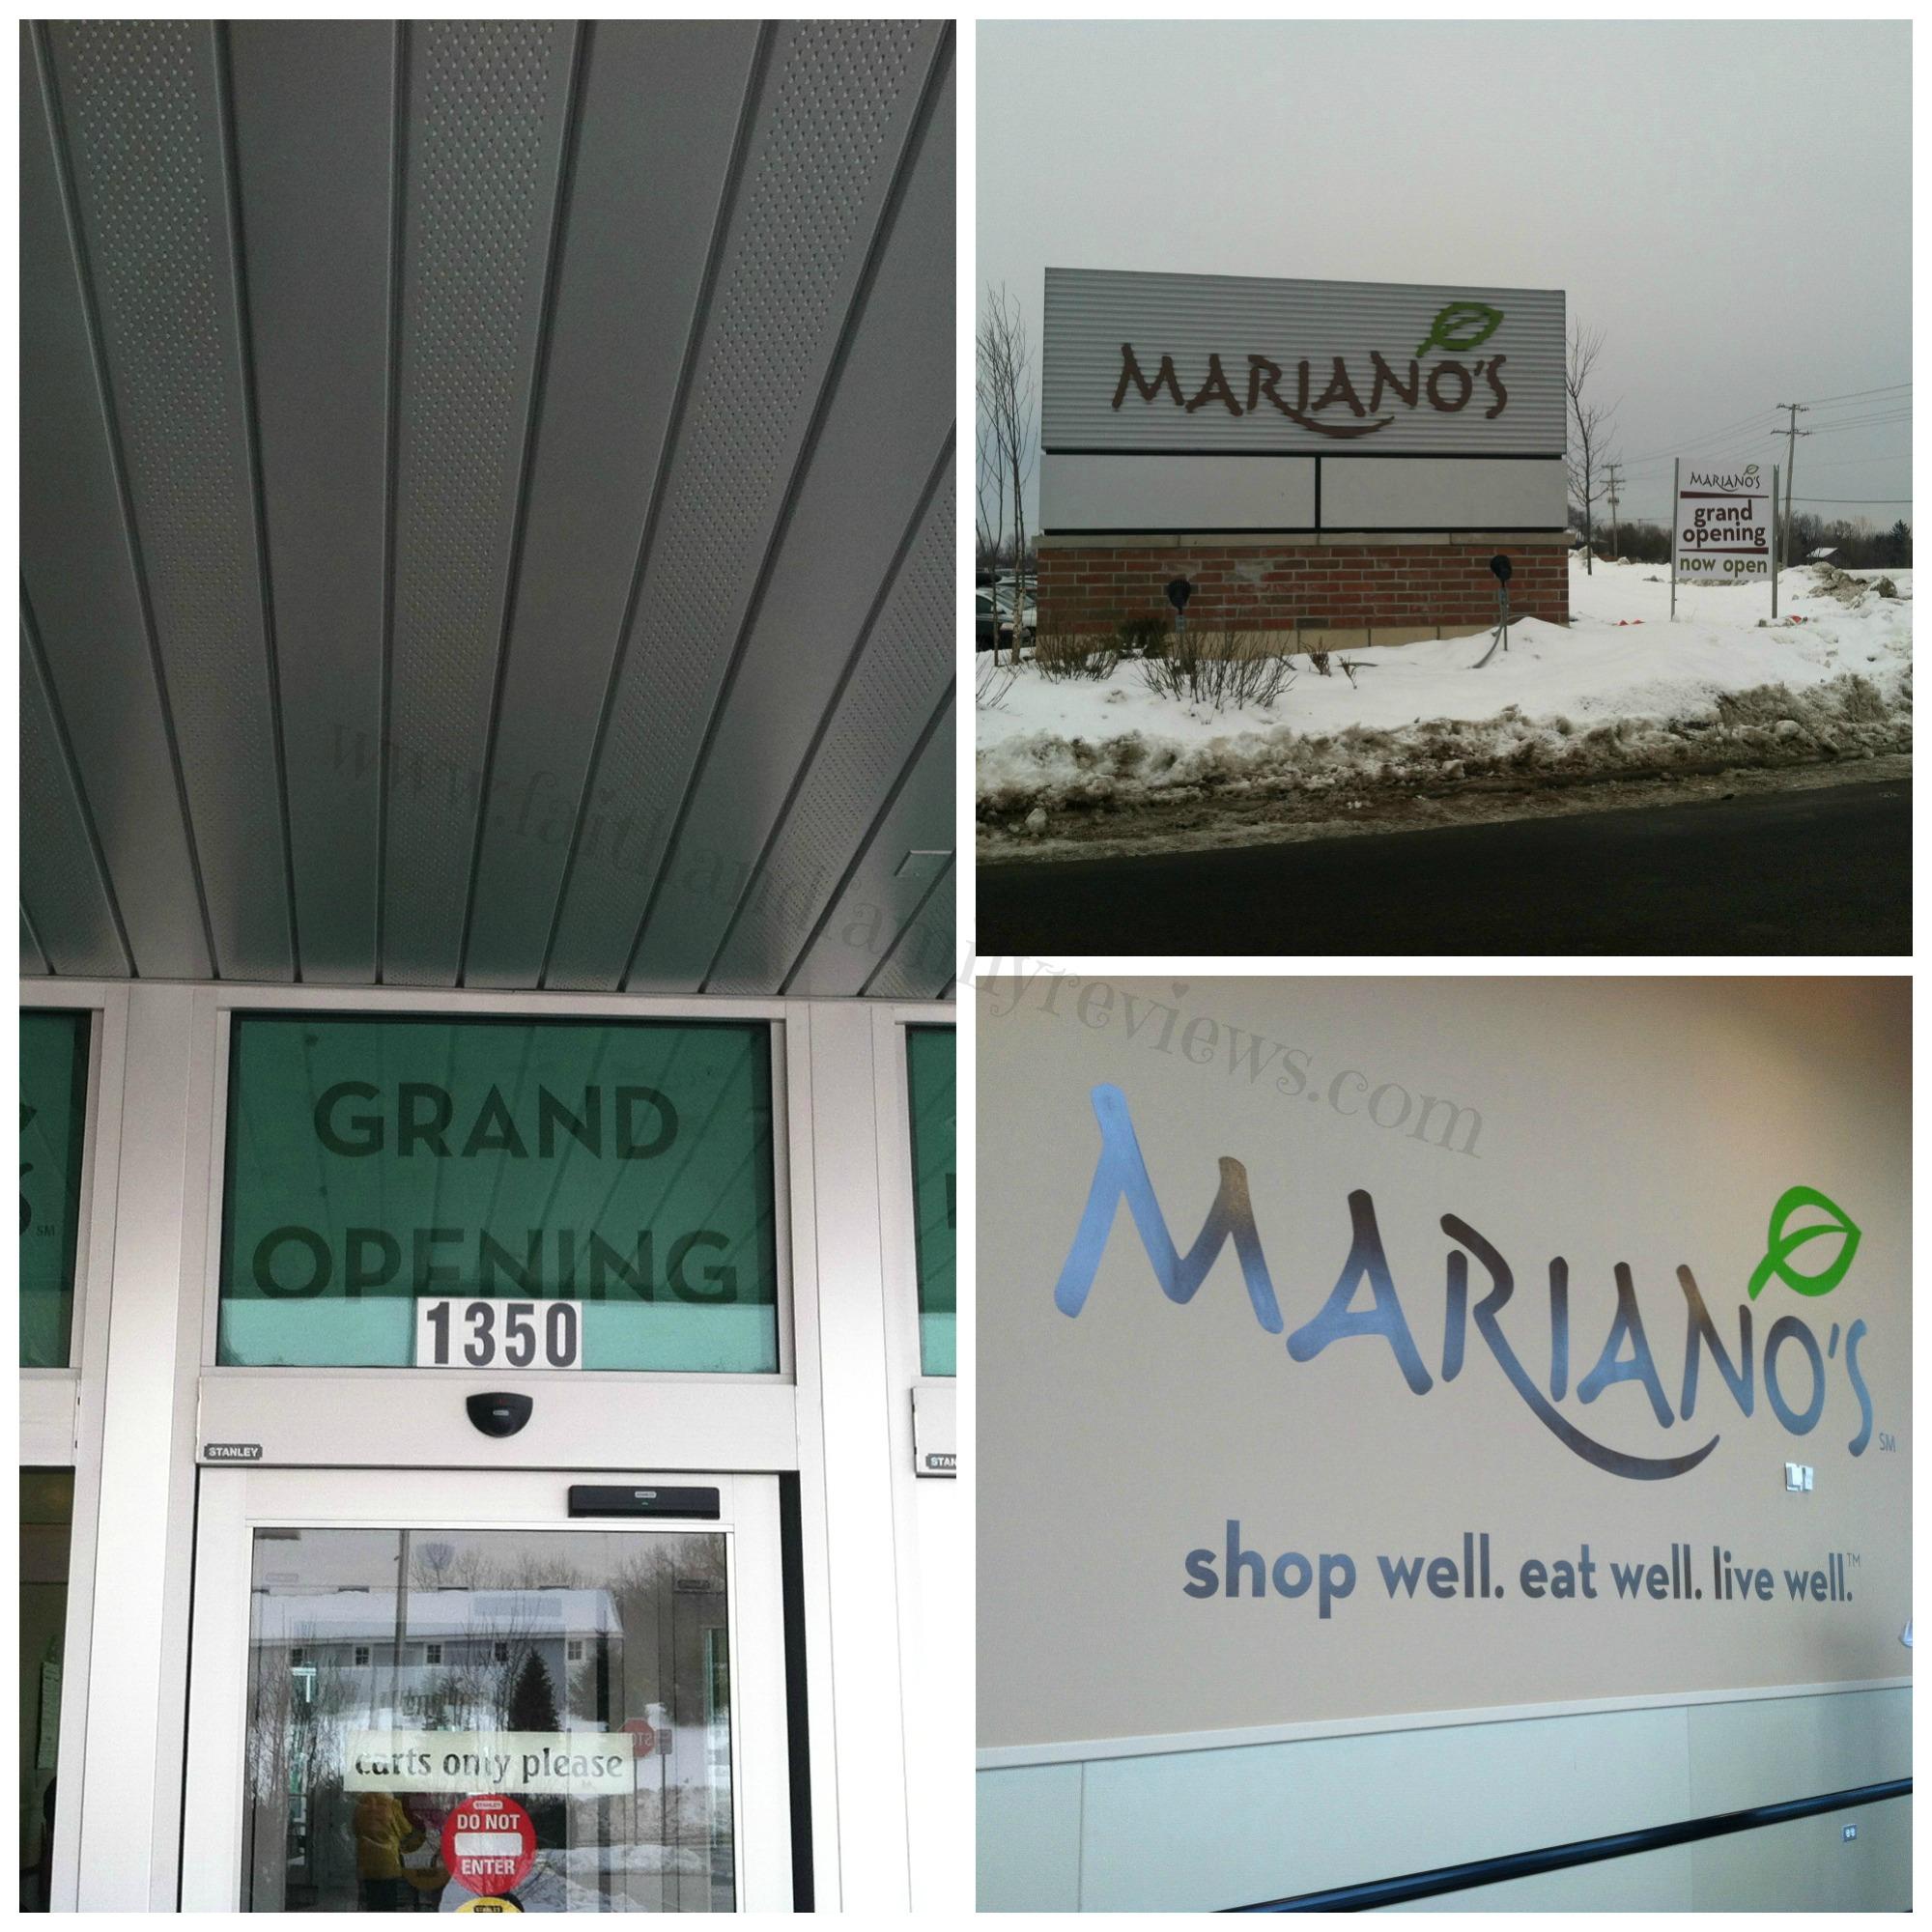 FFR Grocery Store Chicago Mariano's Lk Zurich Grand Opening